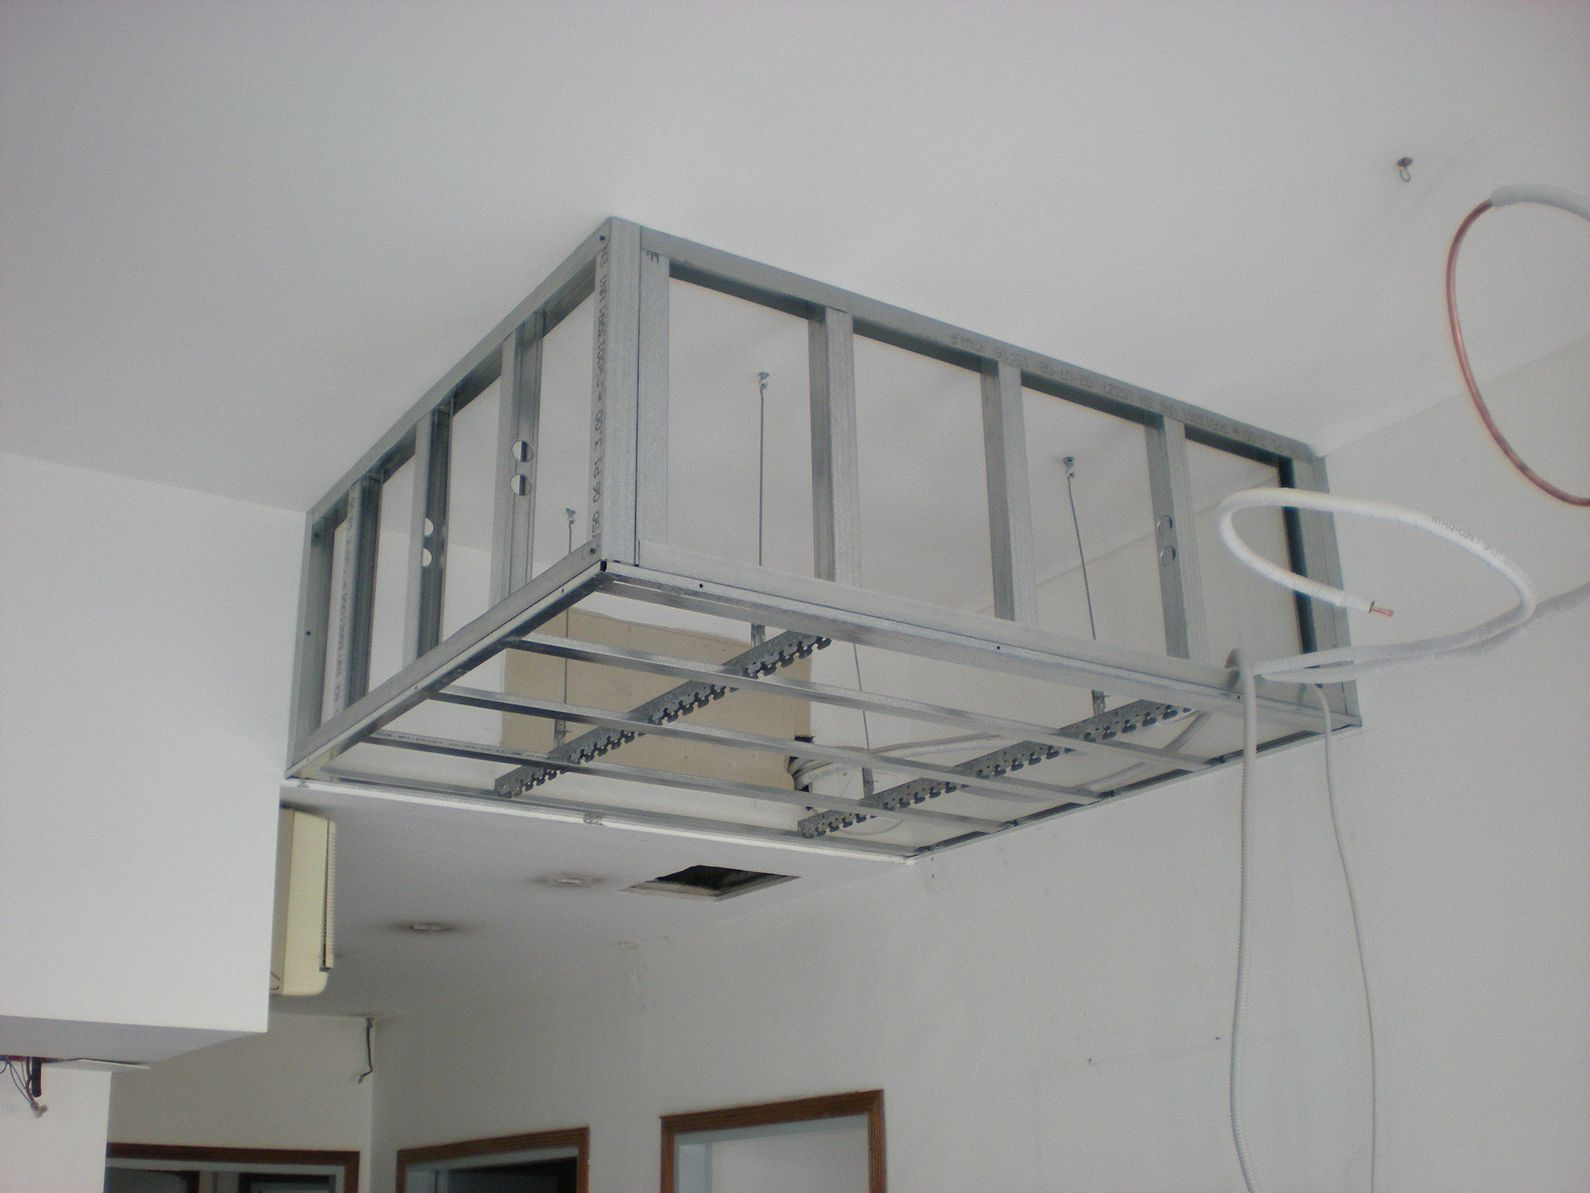 Cartongesso Struttura2 Jpg 1 590 1 193 Pixel Plafond Cuisine Faux Plafond Cuisine Plafond